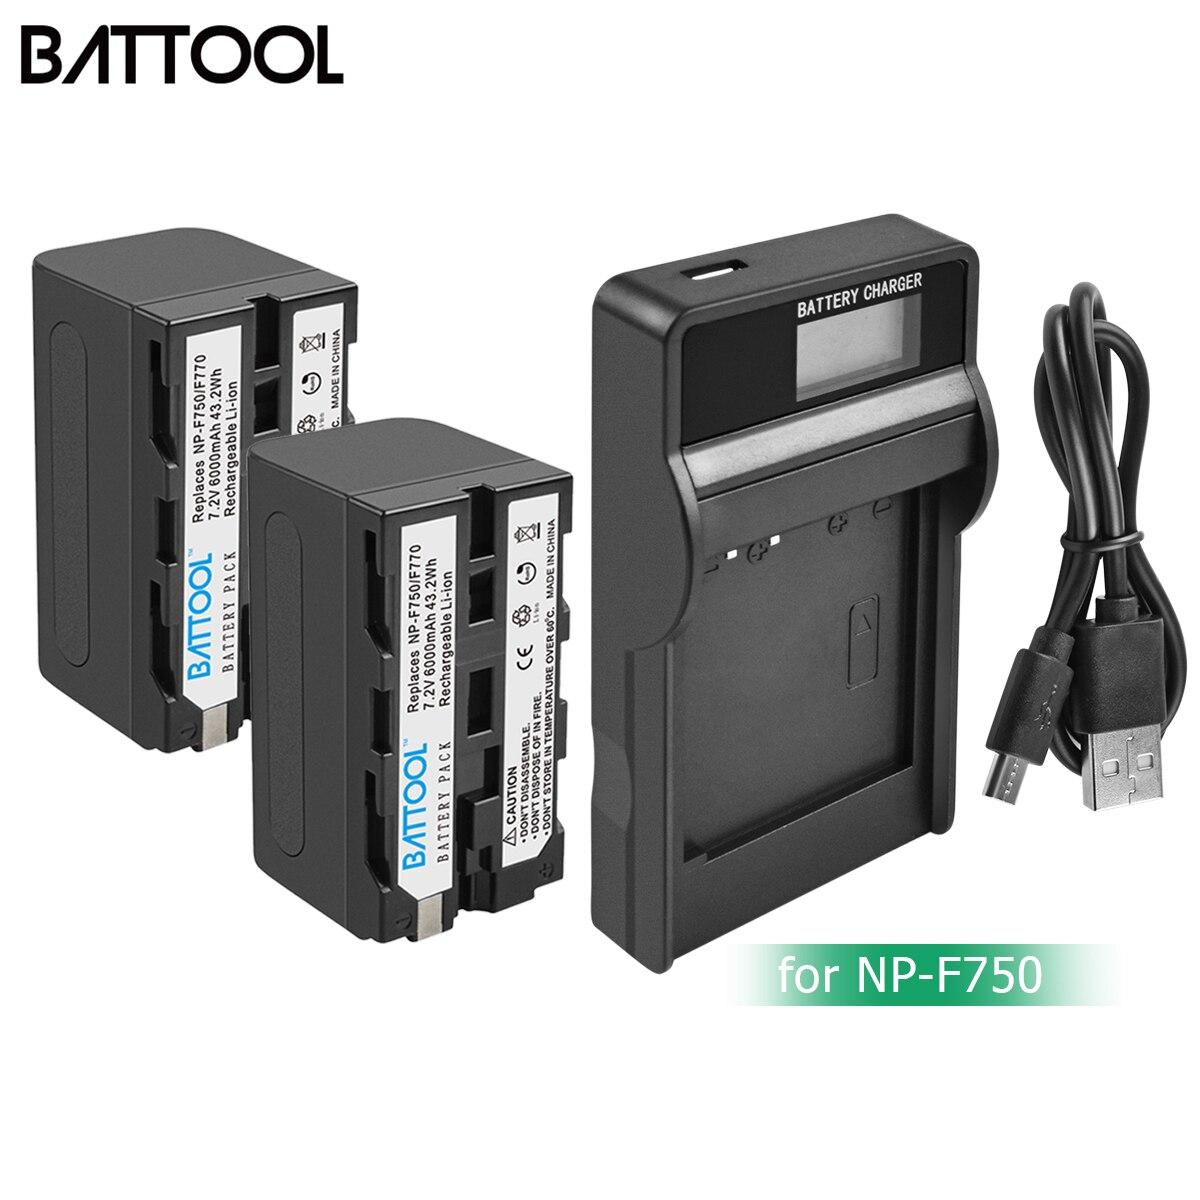 Bonacell 6000mAh NP-F770 NP-F750 NP F770 Np F750 NPF770 750 Batteries+LCD Charger For Sony NP-F550 NP-F770 NP-F750 F960 F970 L10